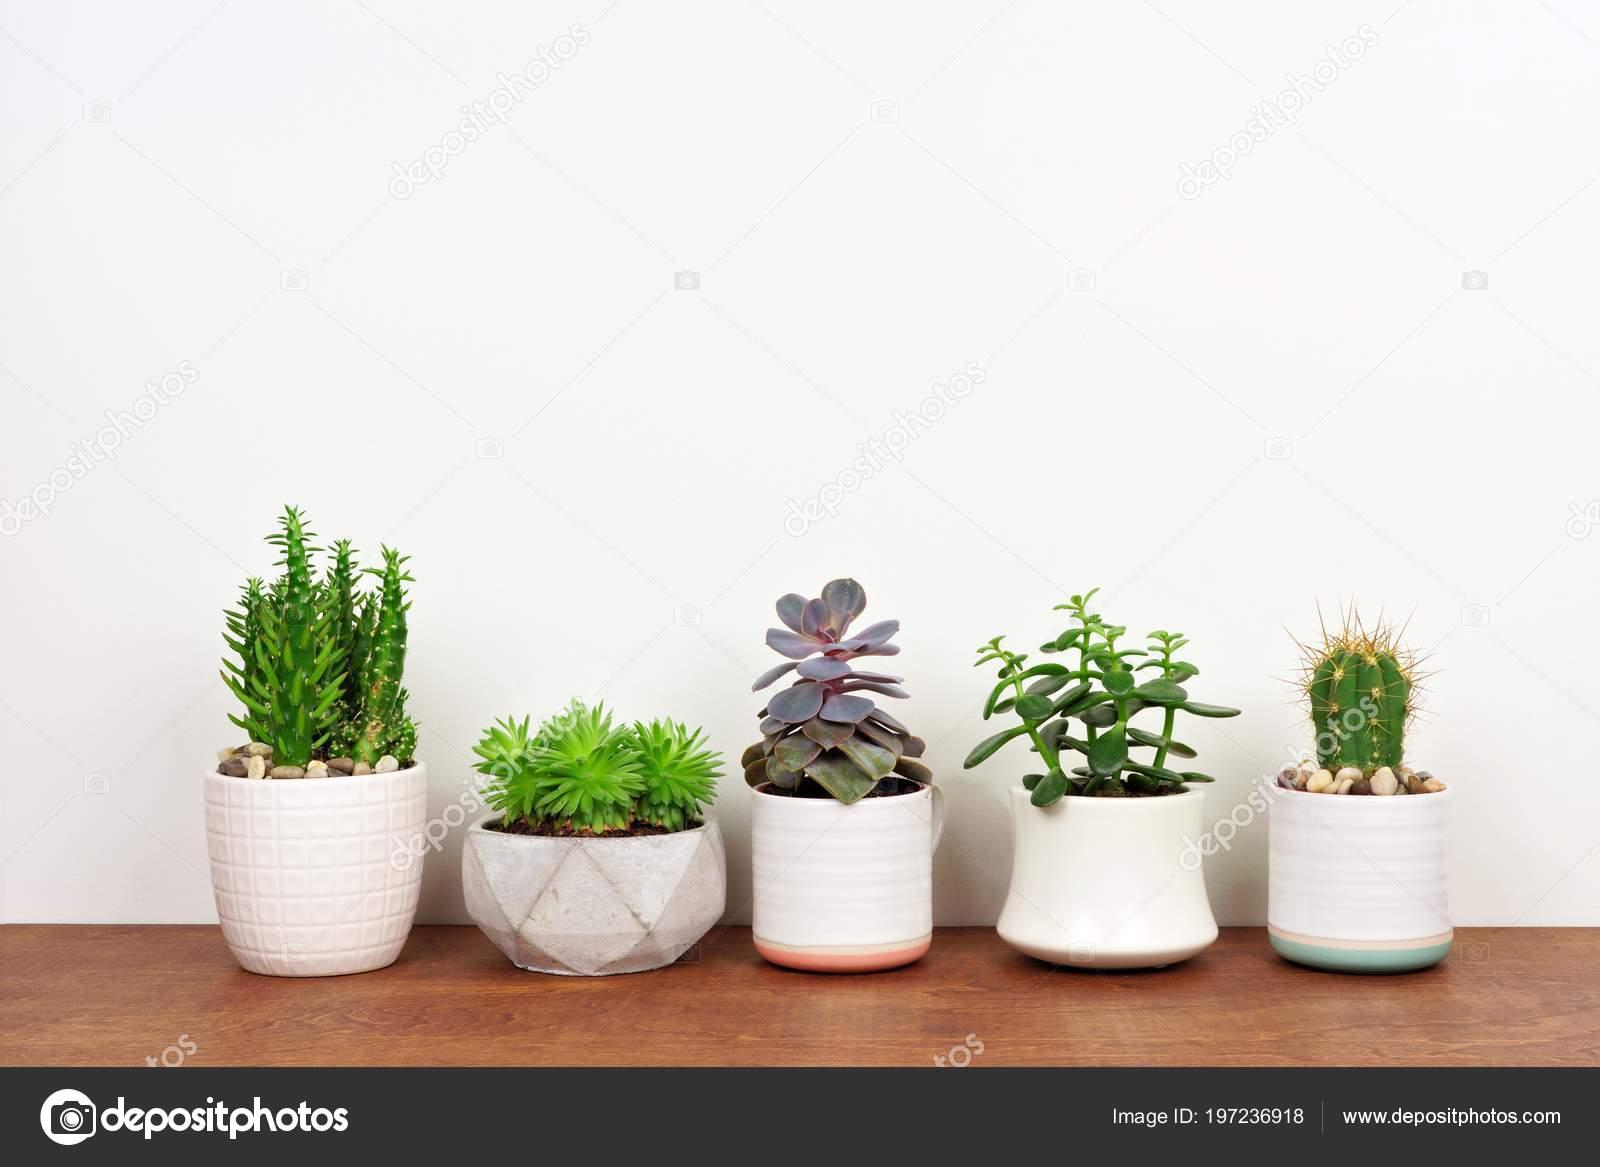 Gruppo vari vaso cactus piante grasse una riga vista laterale